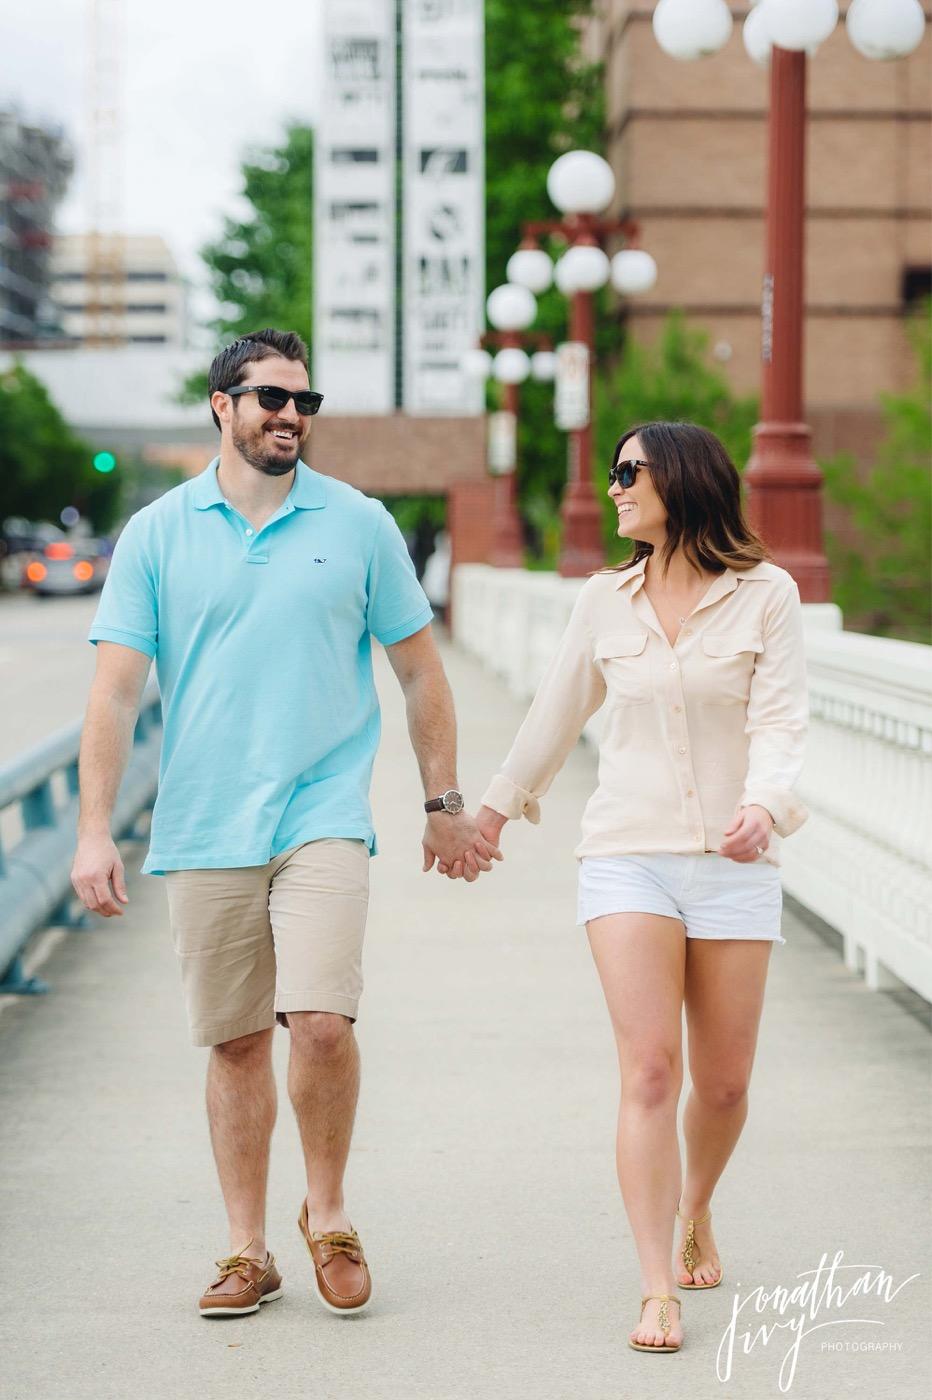 Ray Ban Sunglasses Engagement